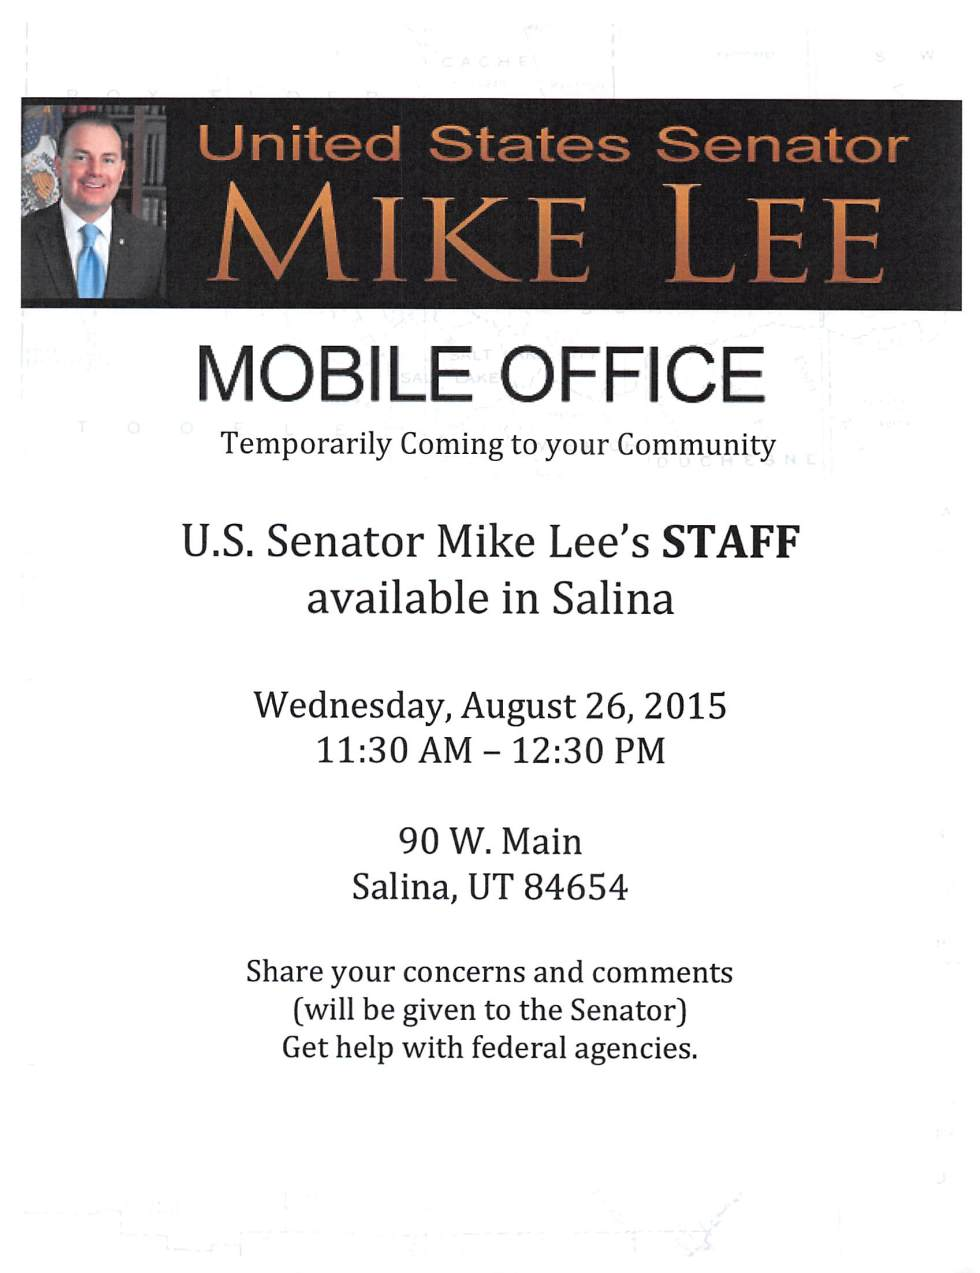 United States Senator Mike Lee in Salina Utah August 26th, 2015